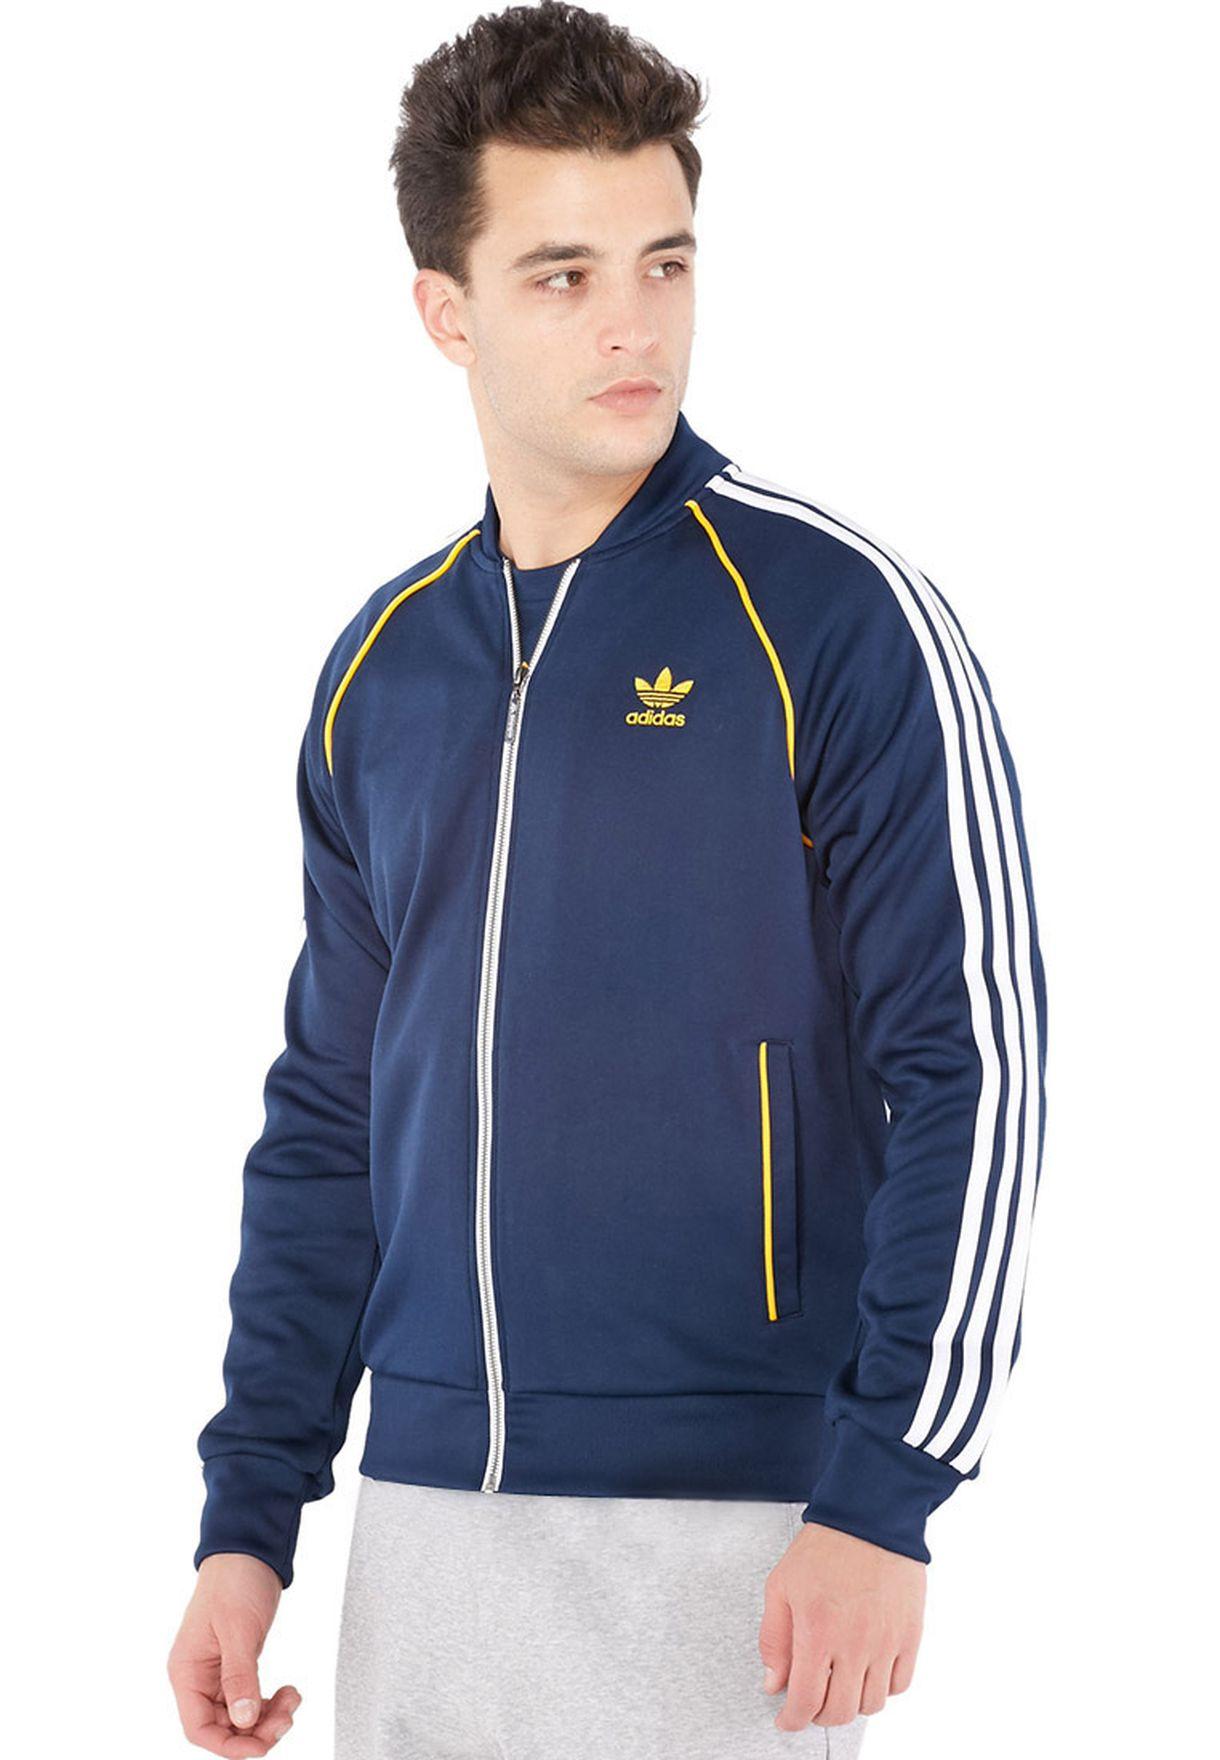 c0125cfd41ac Shop adidas Originals blue Essential Trefoil Track Jacket S19174 for ...